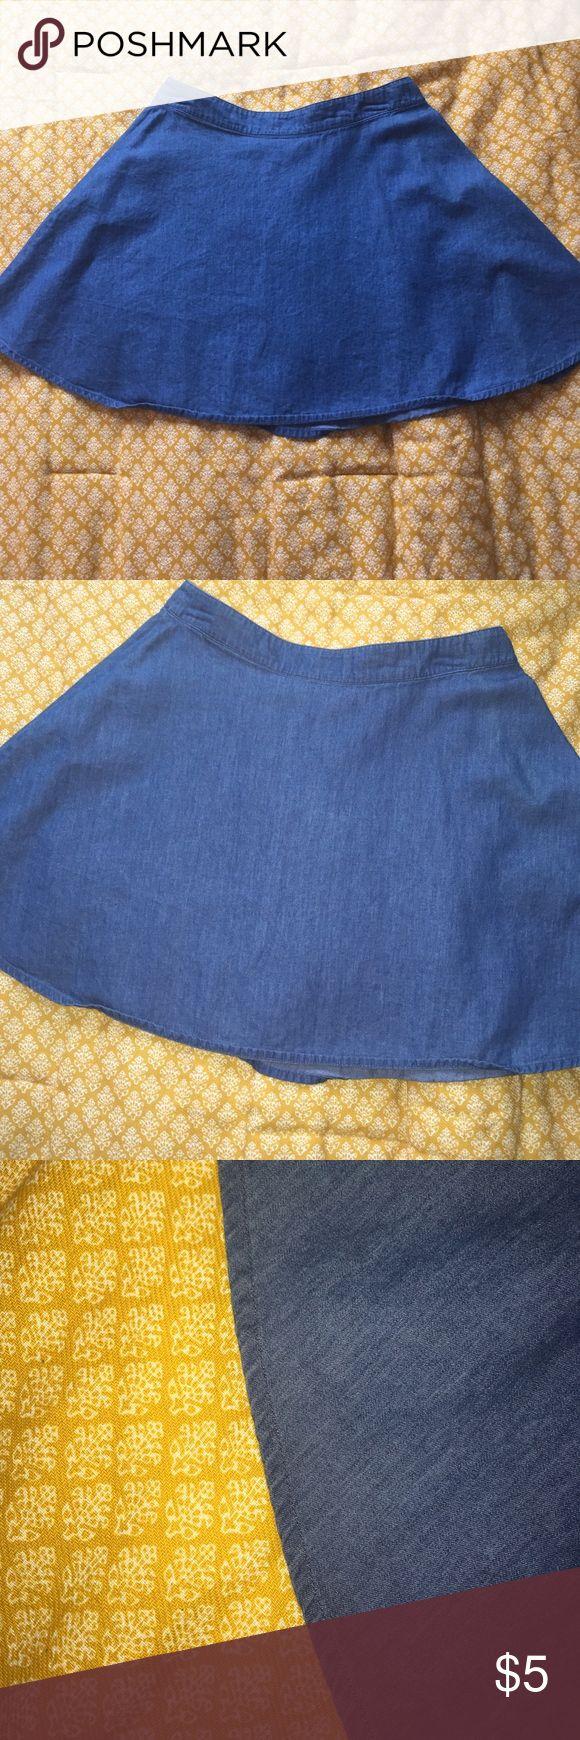 MD Forever 21 Denim Skater Skirt Medium Forever 21 denim skater skirt. Soft, 100% cotton. 16 inches long. Waist line is about 13.5 inches. 6 inch zipper on back. Really good condition. Forever 21 Skirts Circle & Skater